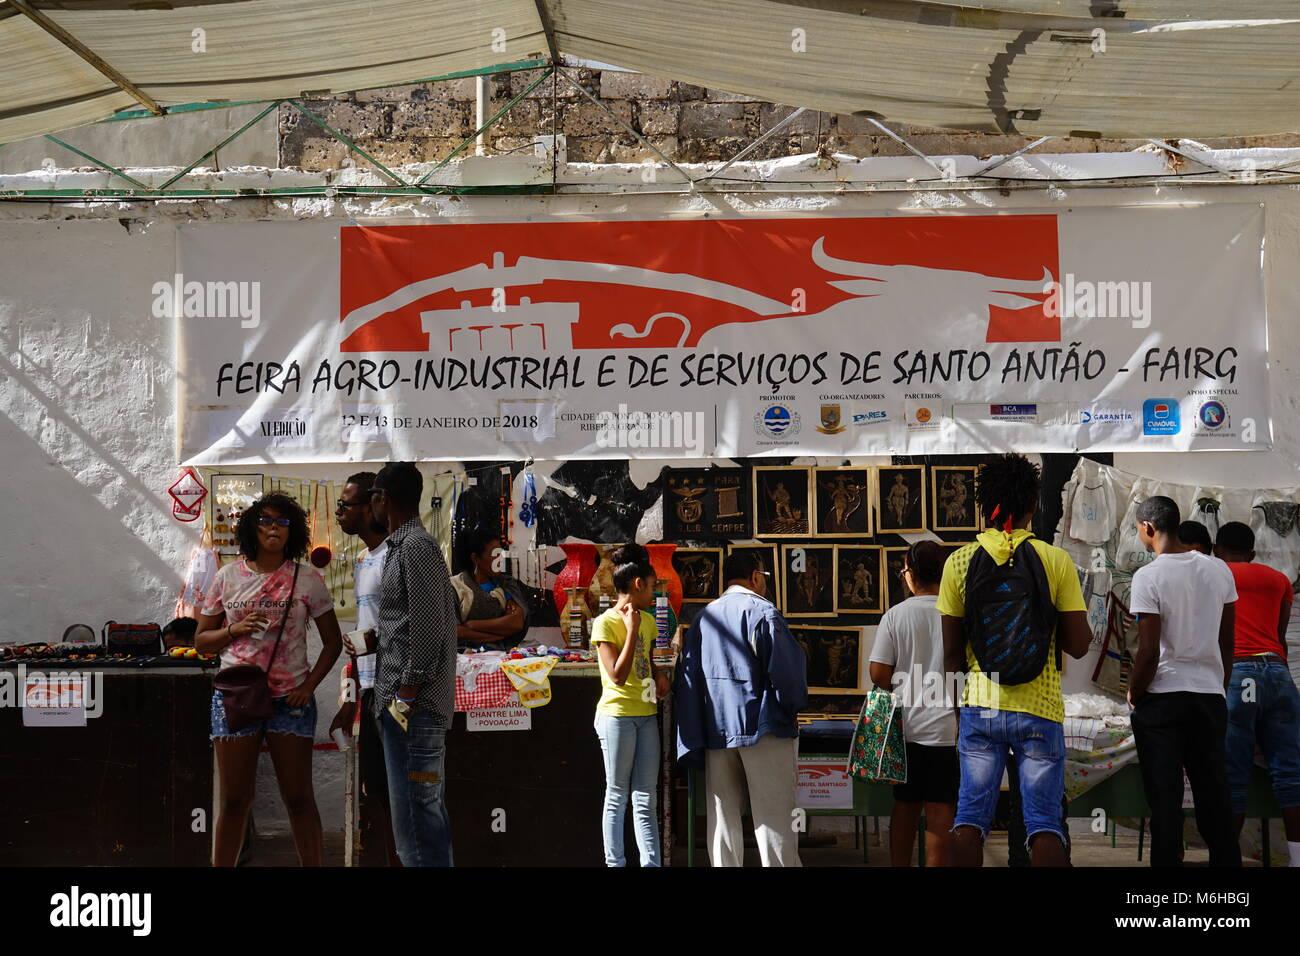 exhibition of region-specific products, Ponta do Sol, Santo Antao, Cape Verde - Stock Image